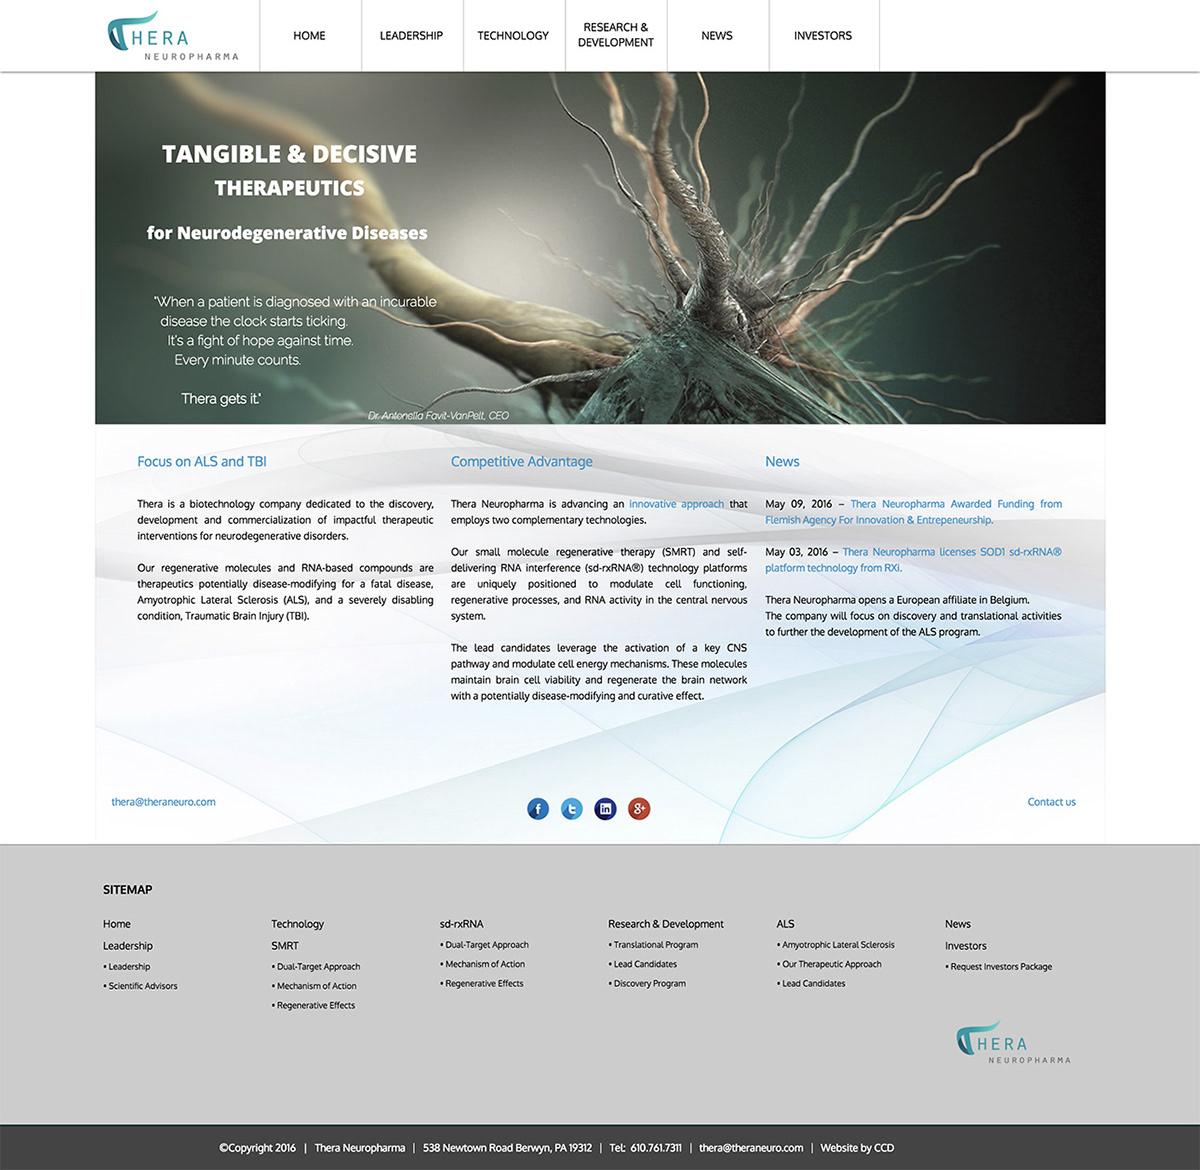 brandidentity Website dreamweaver Webdesign webdevelop HTML css graphicdesign logo